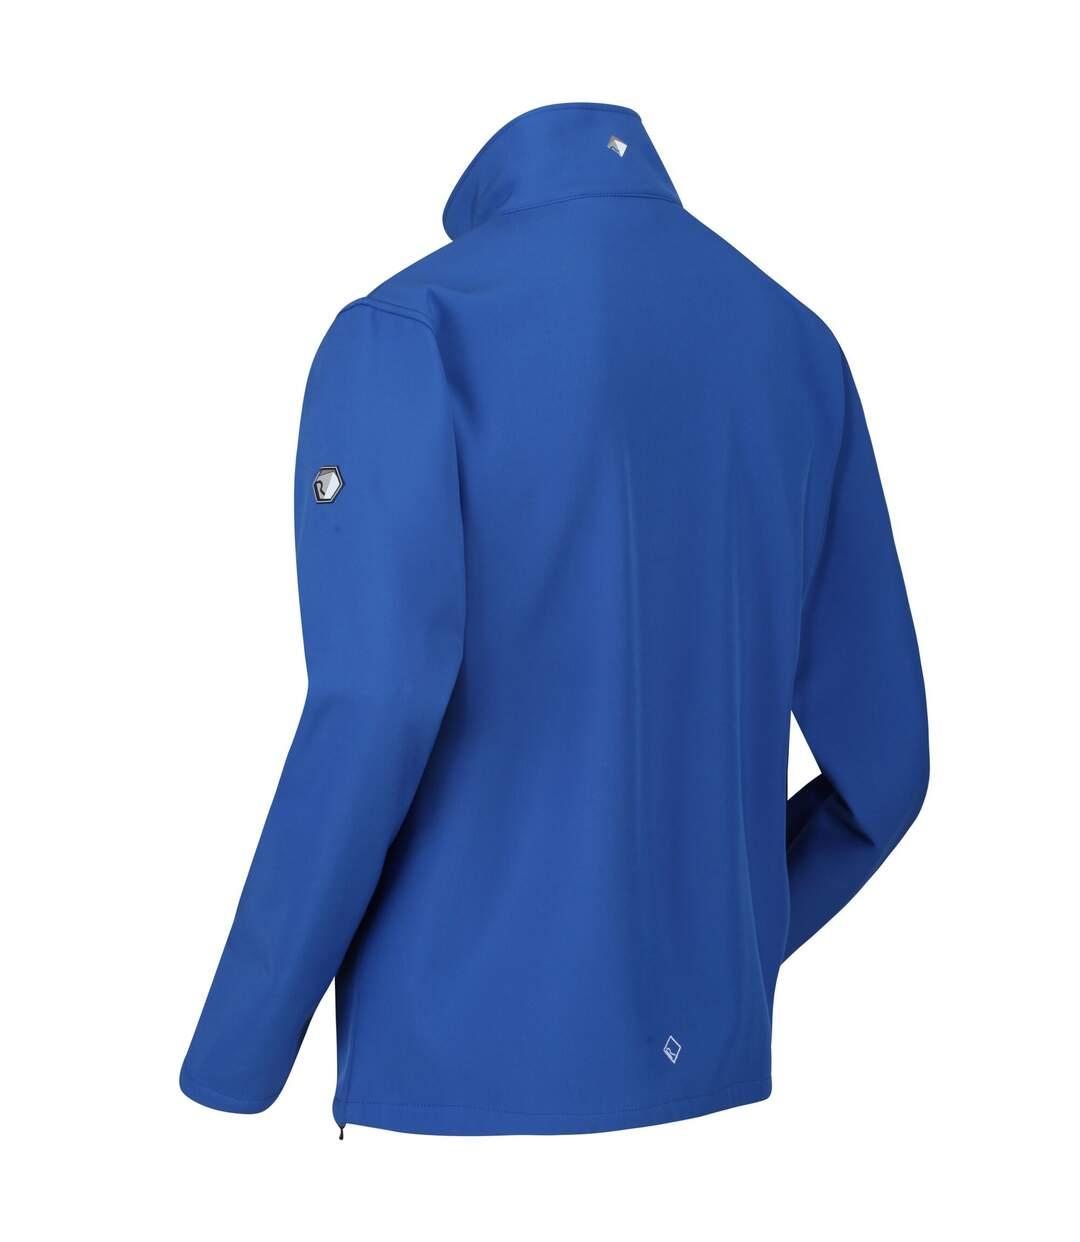 Regatta Mens Cera IV Softshell Jacket (Nautical Blue) - UTRG4918